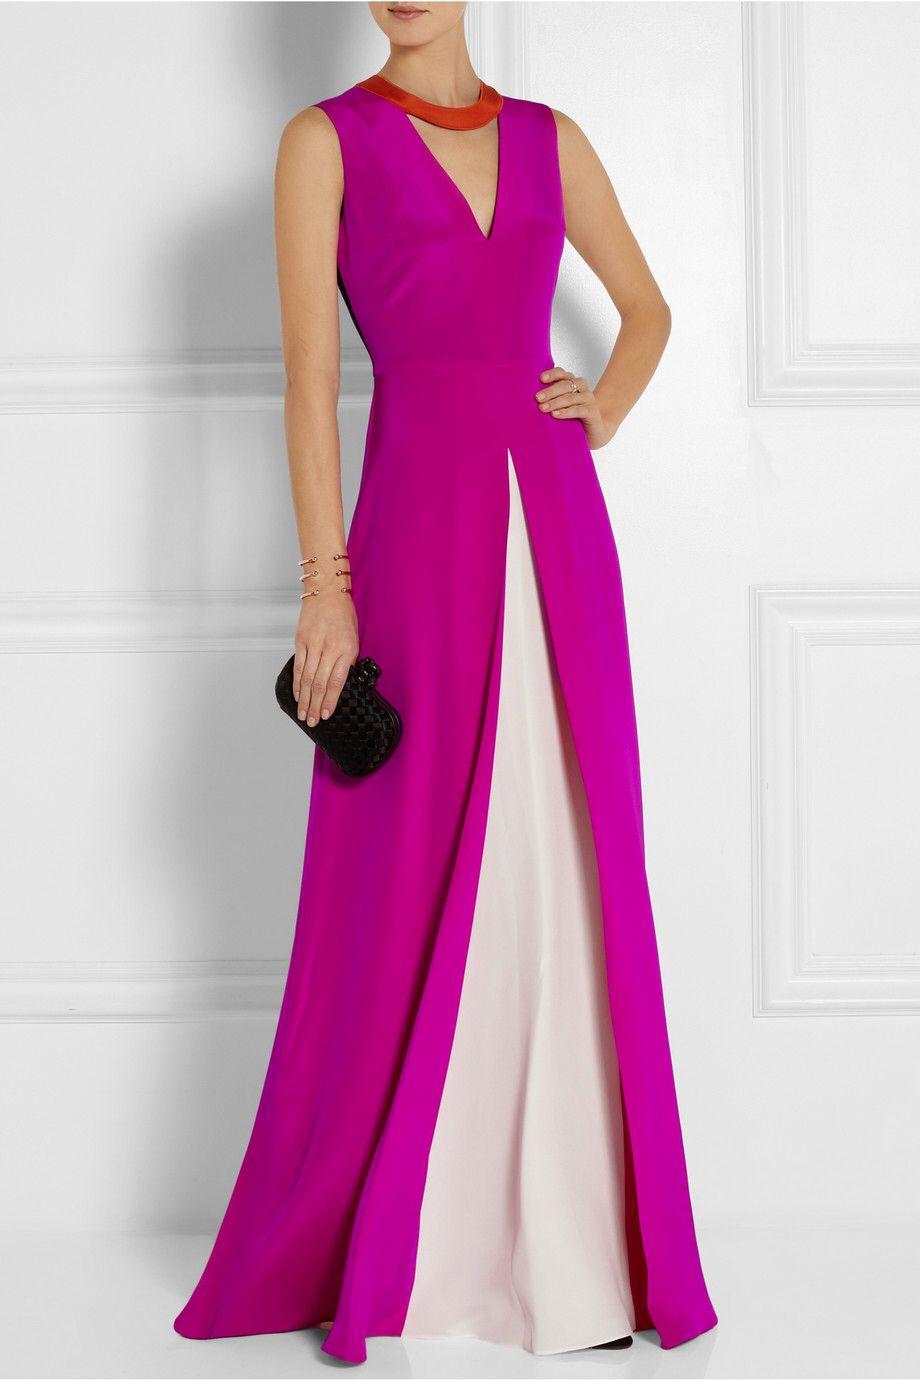 Roksanda Ilincic fushia dress | moda | Pinterest | Brillar y Fiestas